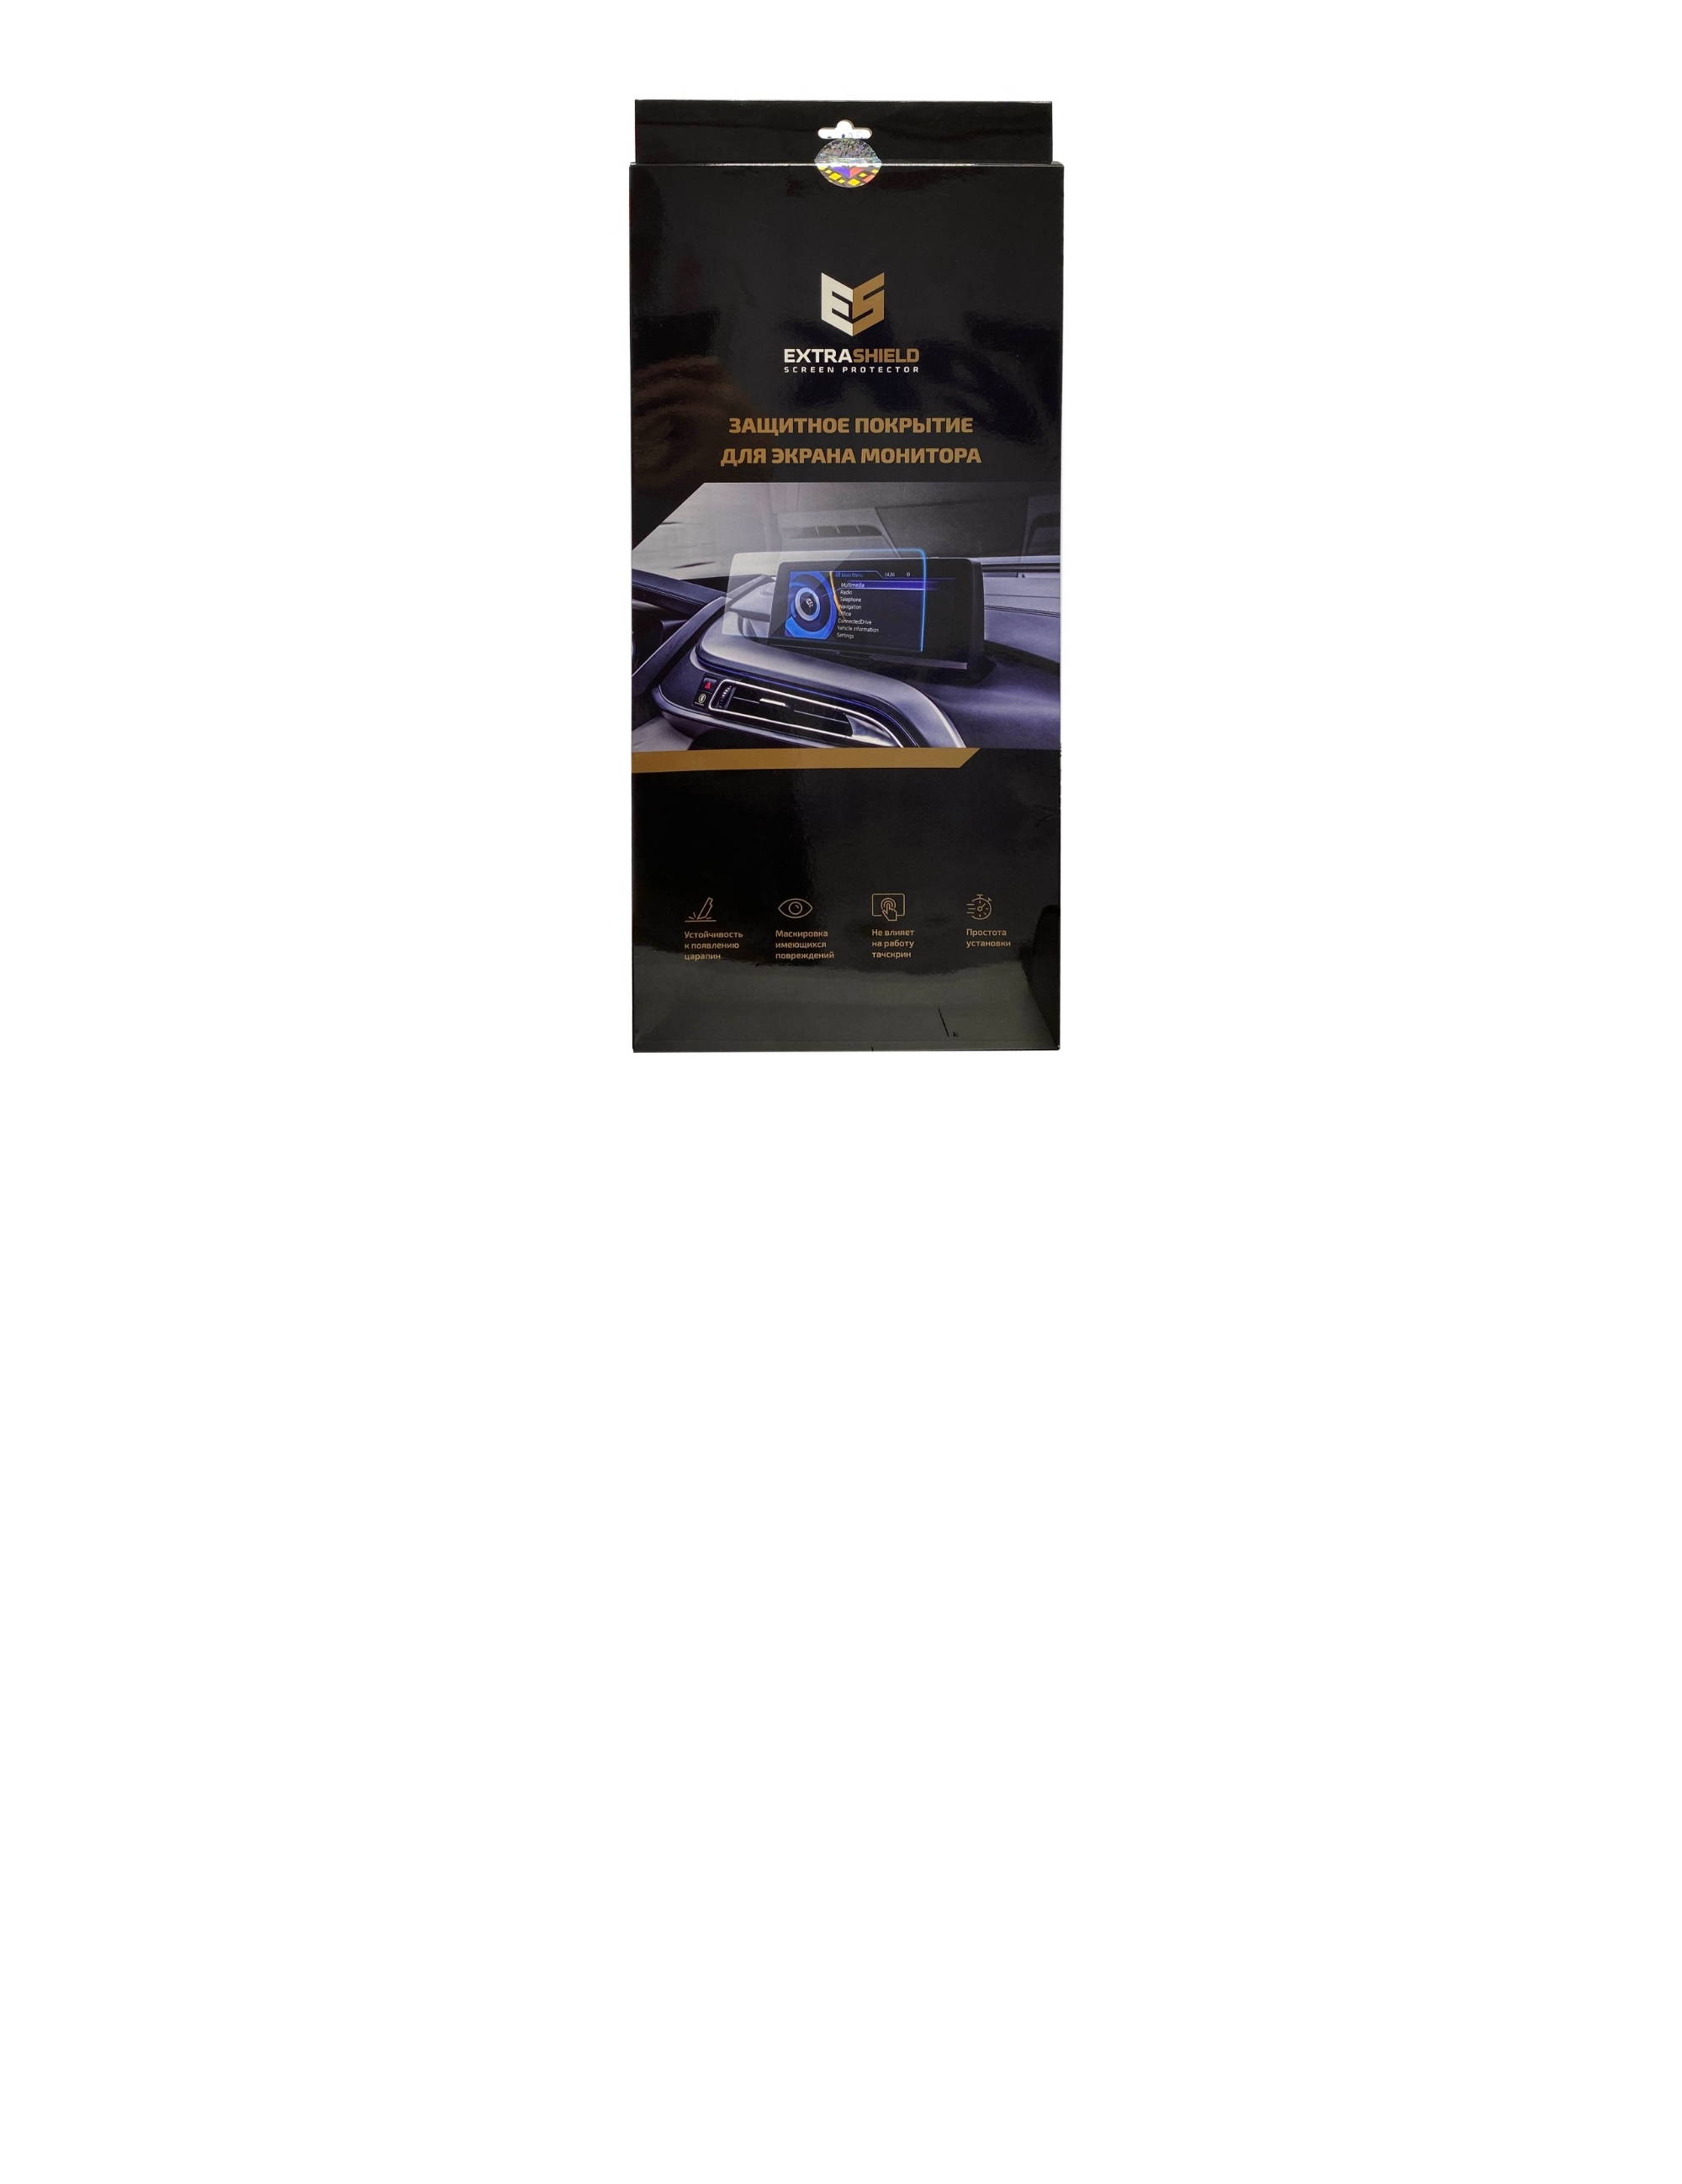 Audi A4 (B9) 2015 - н.в. мультимедиа MMI 8,3 Статическая пленка Глянец